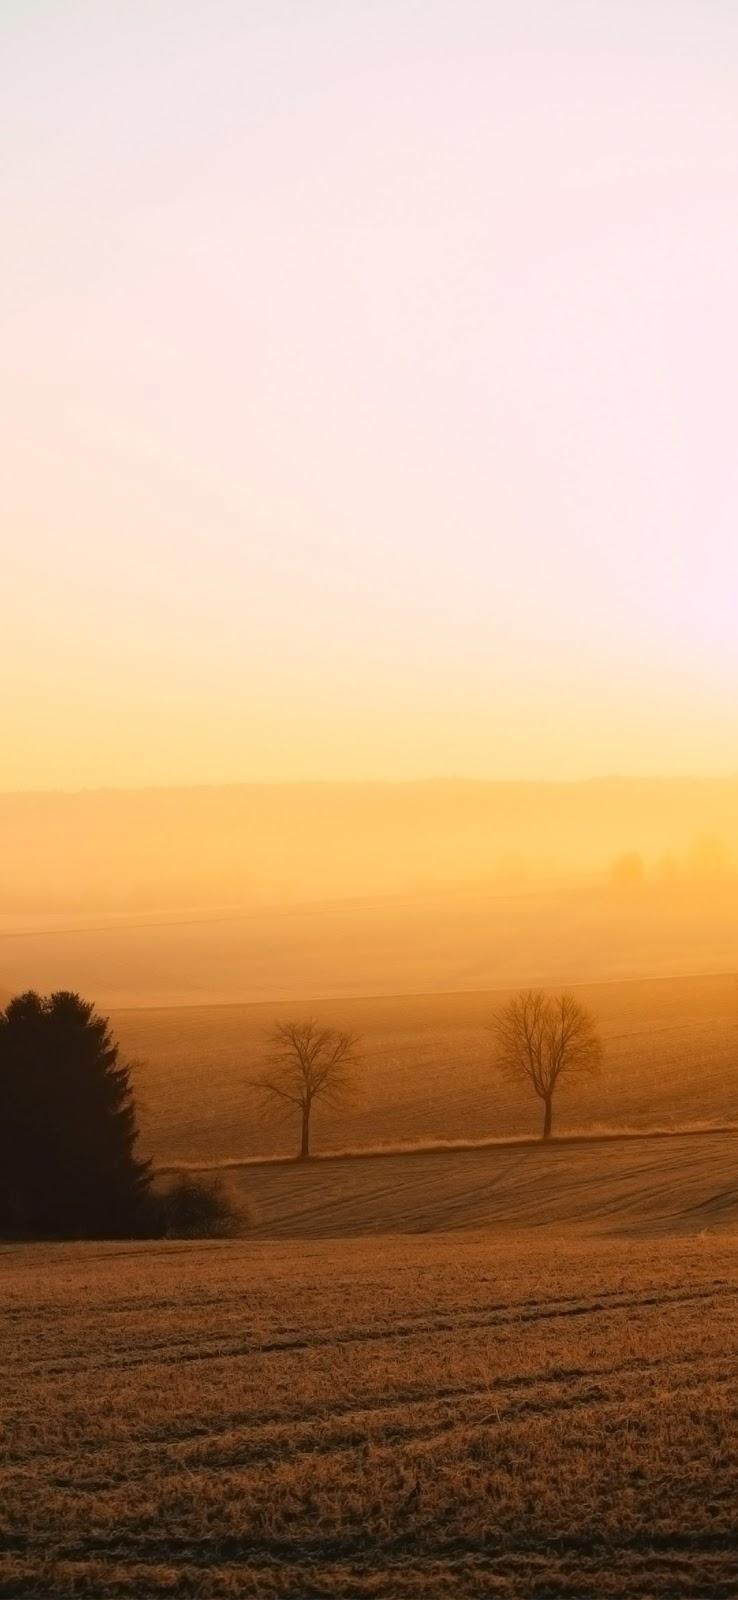 brown field during sunset wallpaper